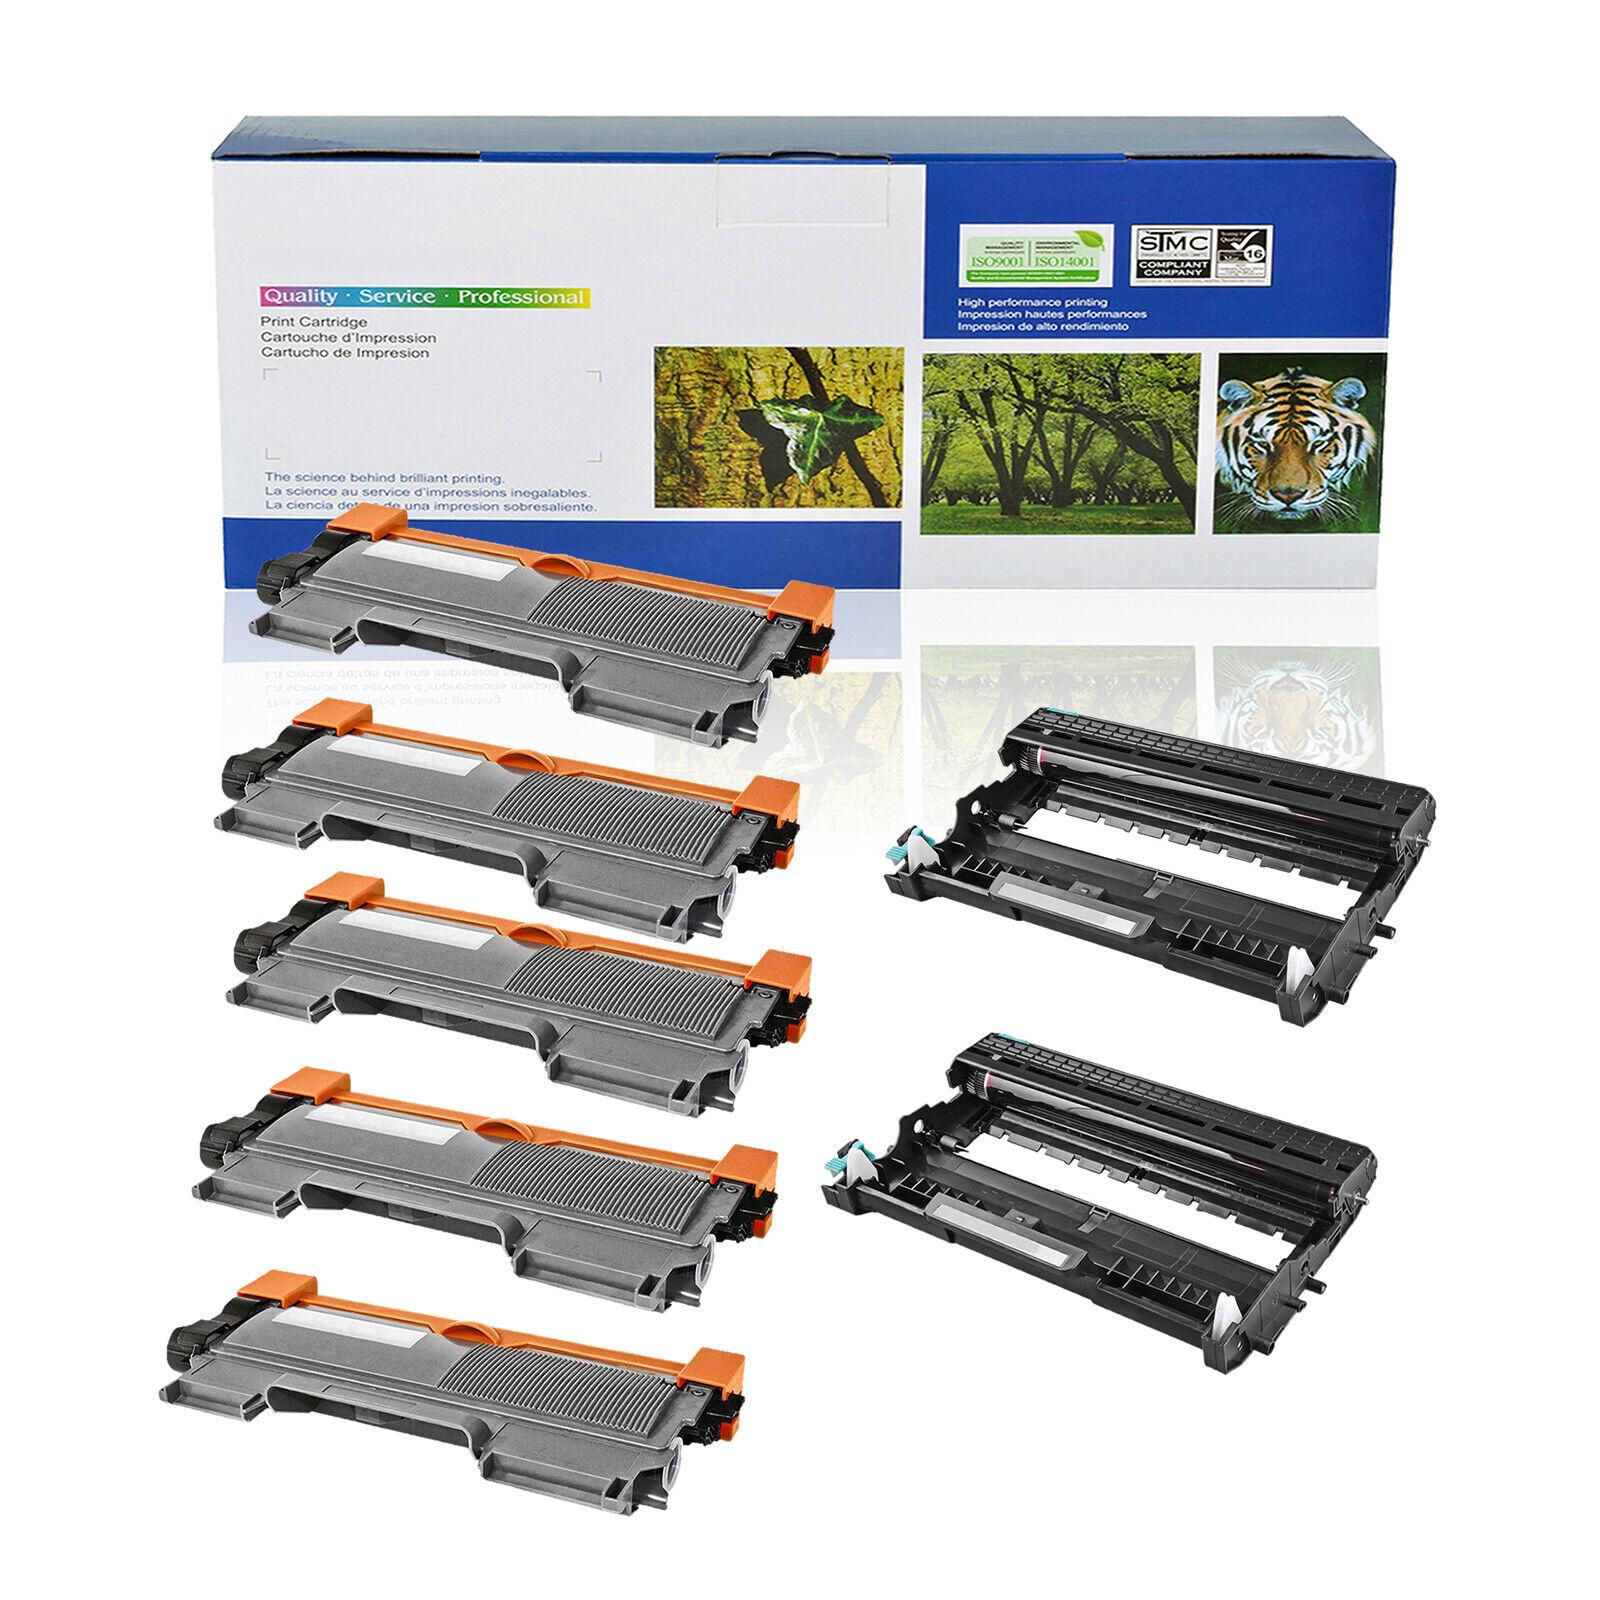 1PK TN350 Black Toner Cartridge For Brother FAX-2810 2820 2825 2910 2920 Series